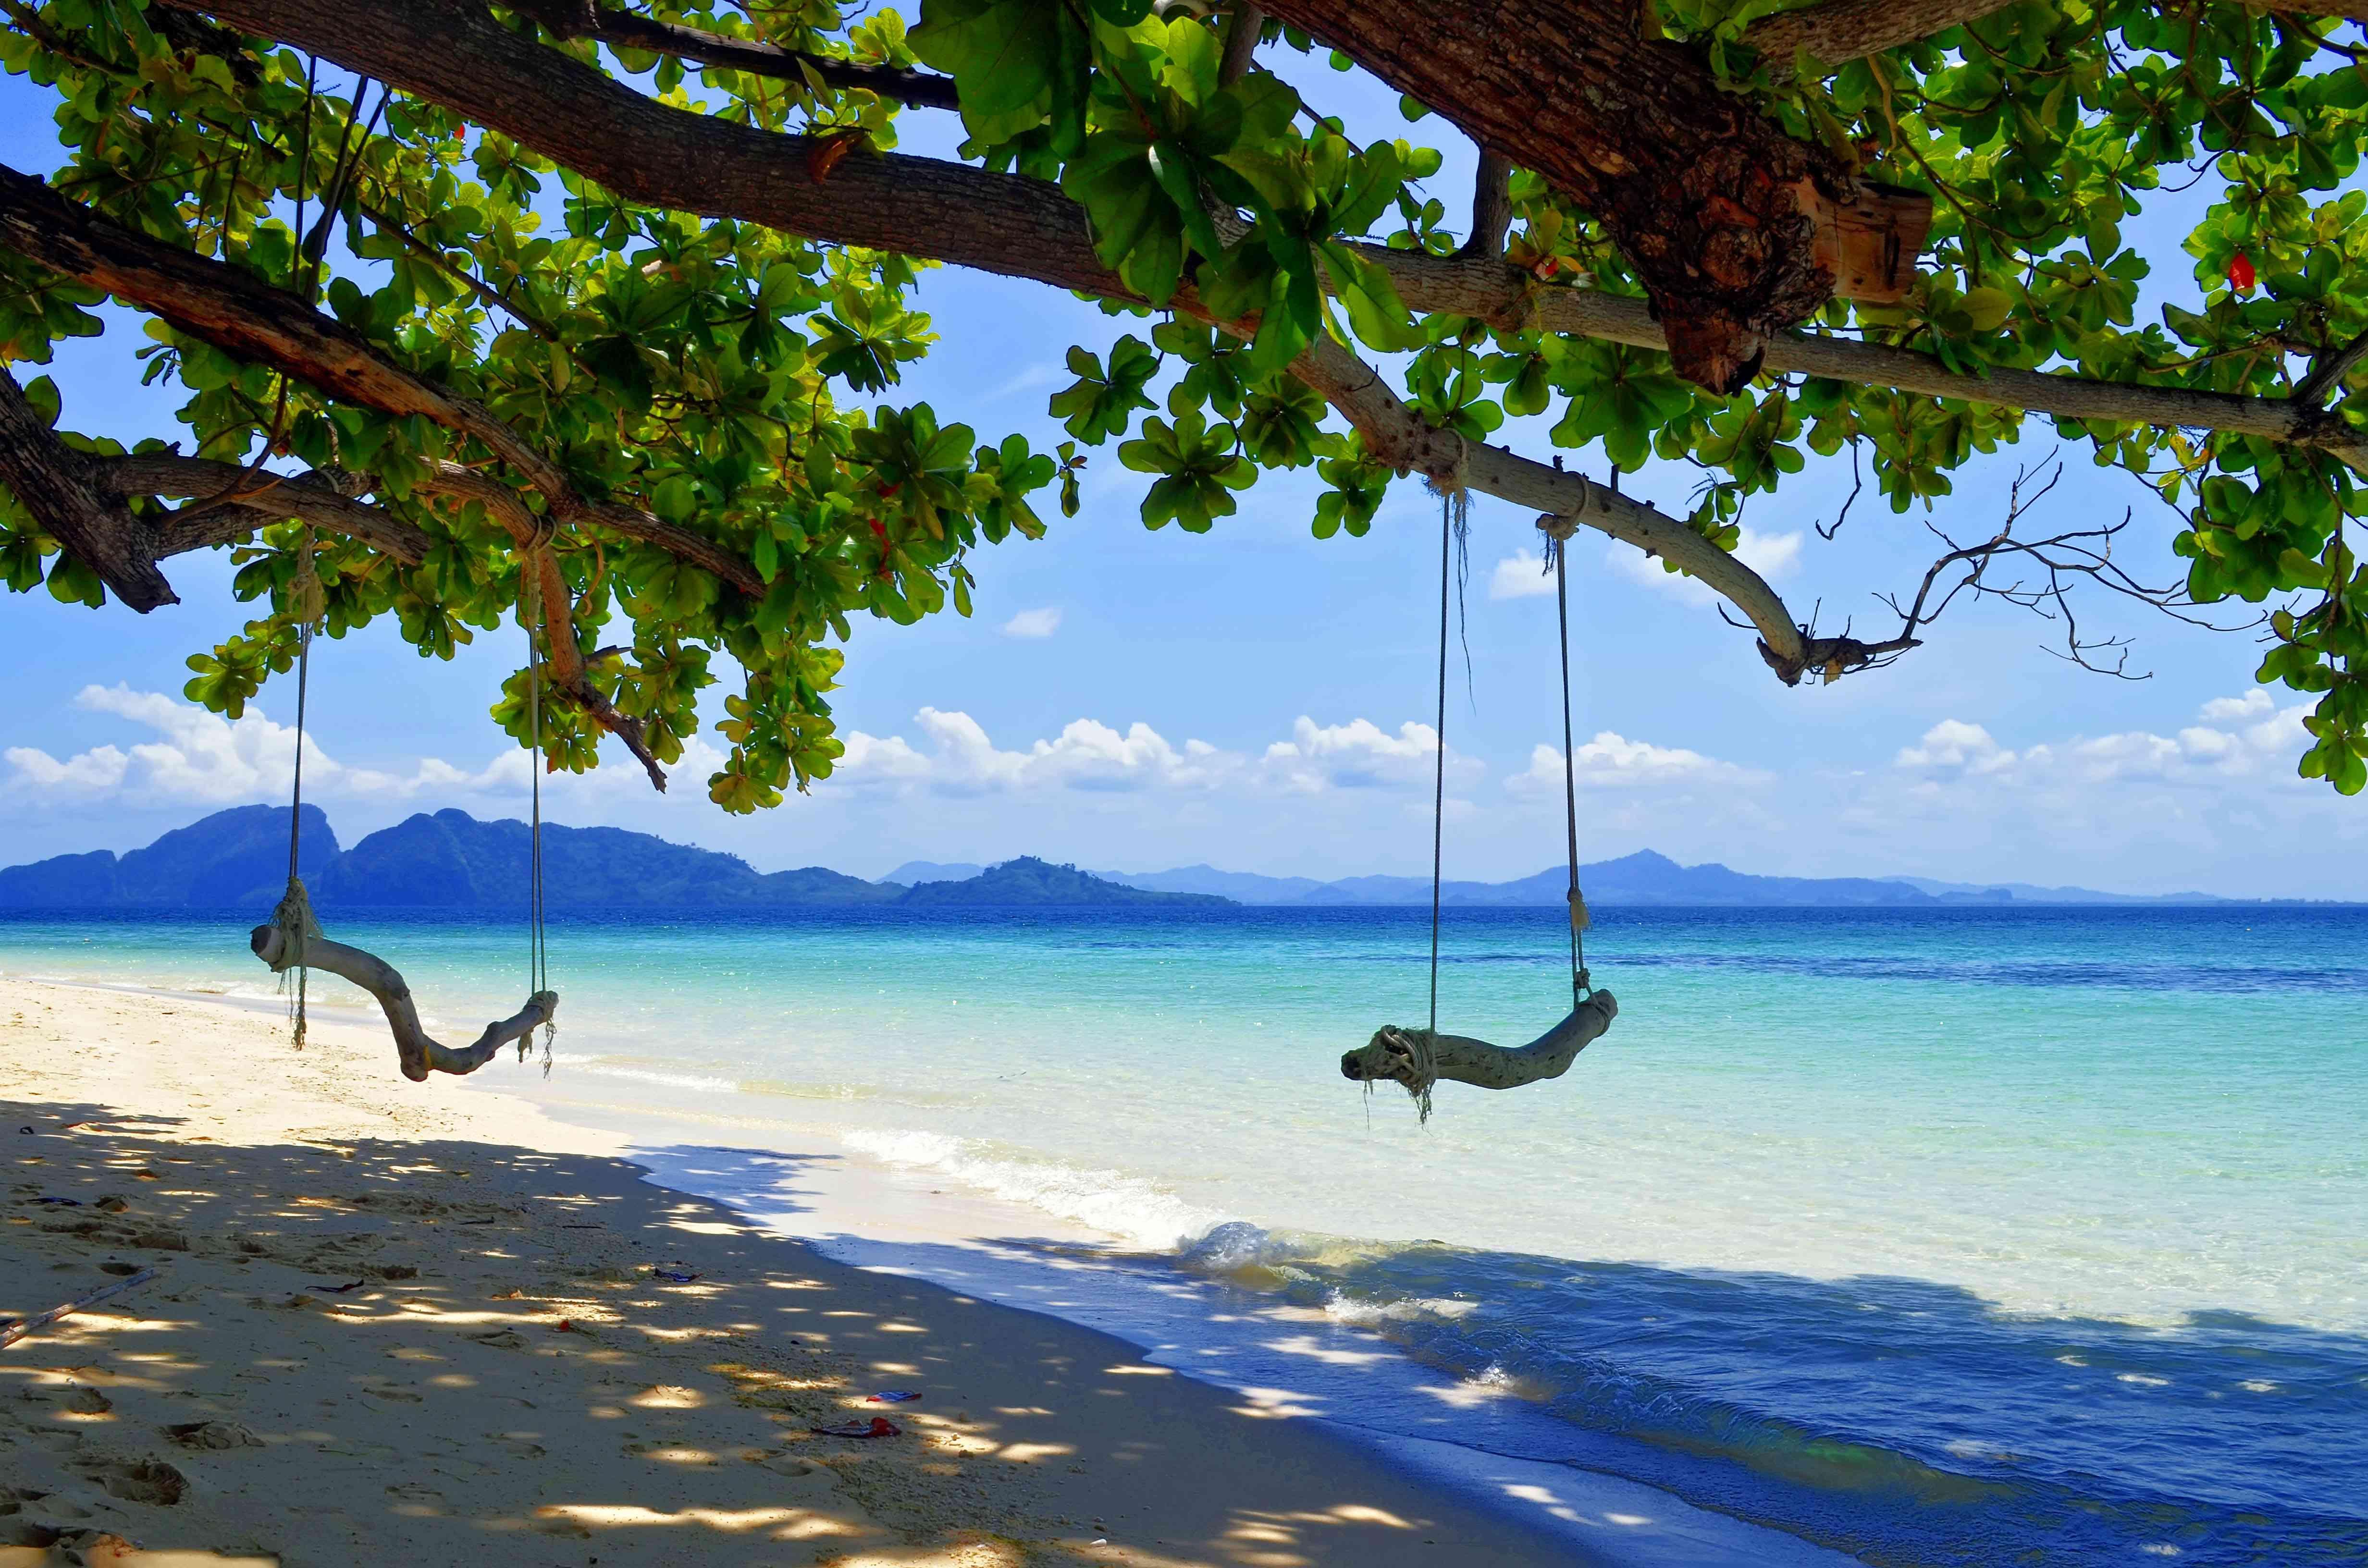 Swings hanging from tree over beach at Koh Kradan